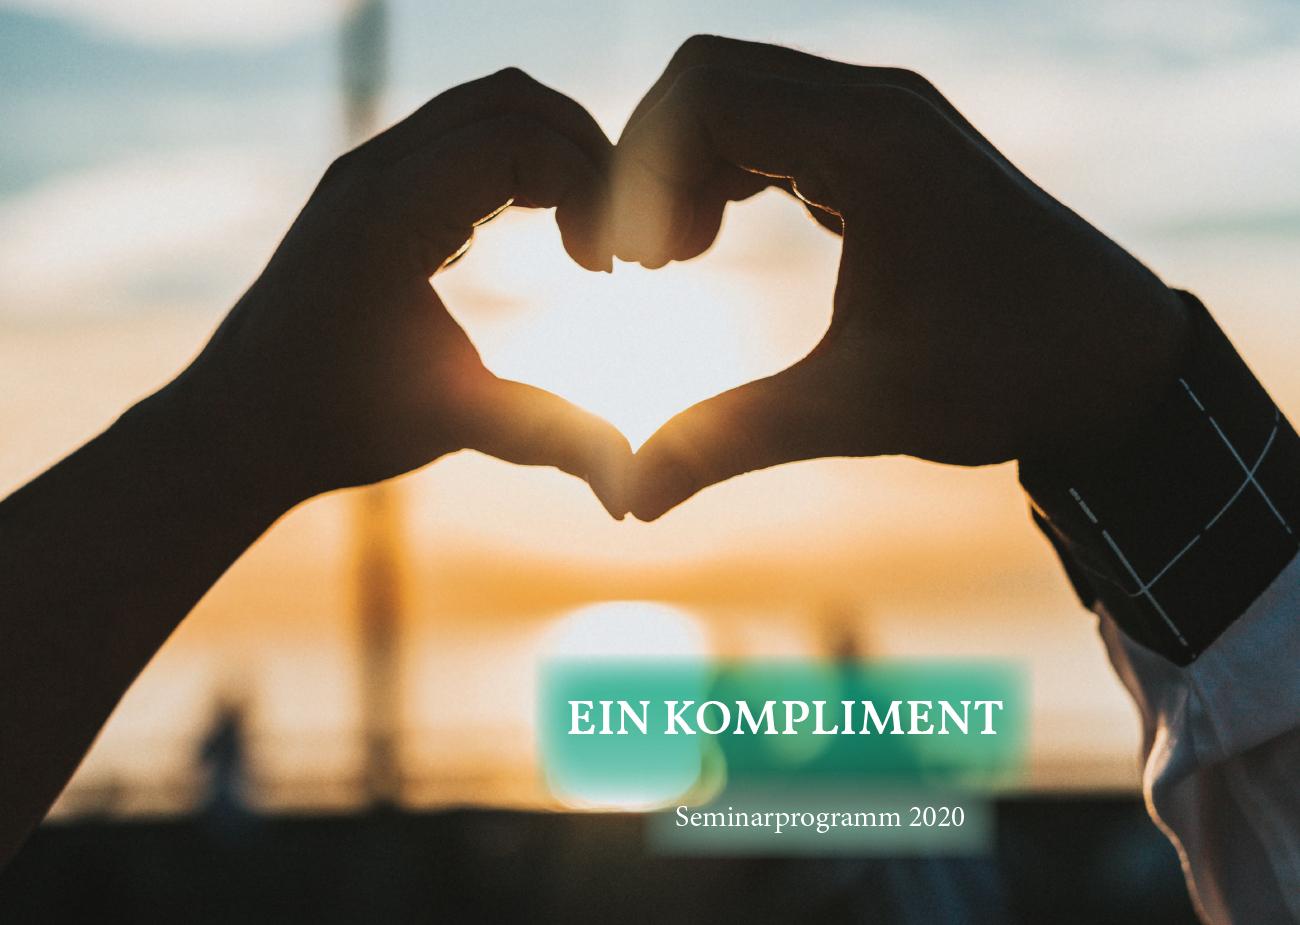 Juzo Akademie Seminarprogramm 2020 Thema Ein Kompliment